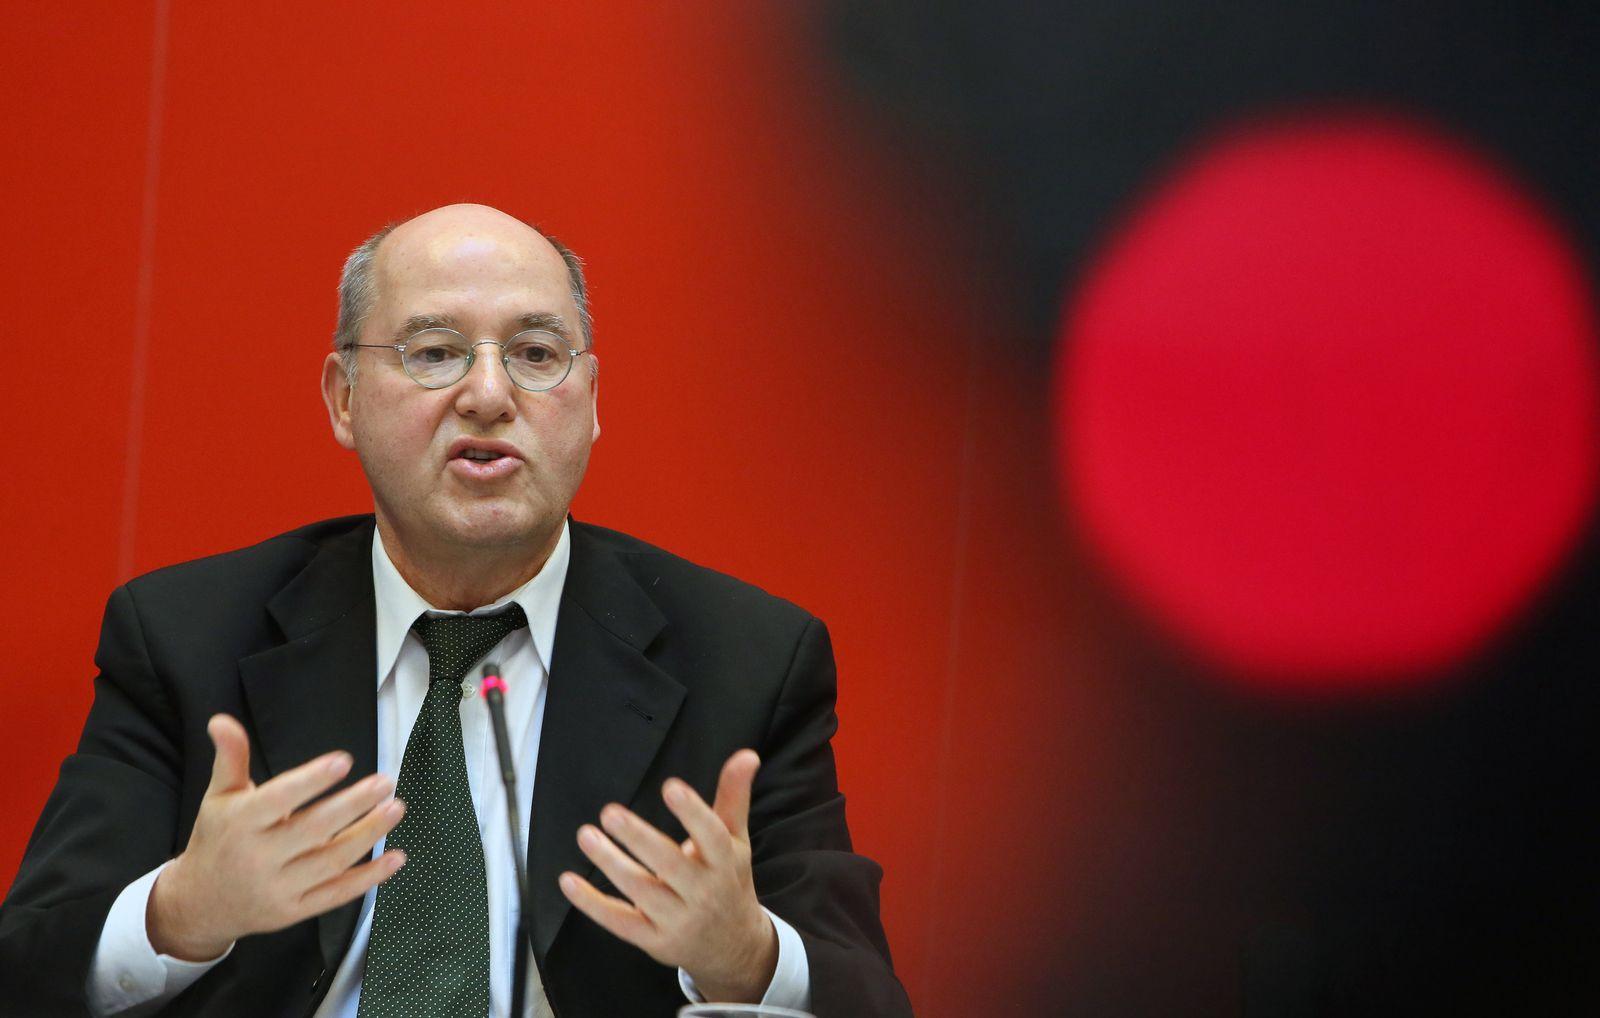 Abschluss Klausurtagung Linke Bundestagsfraktion